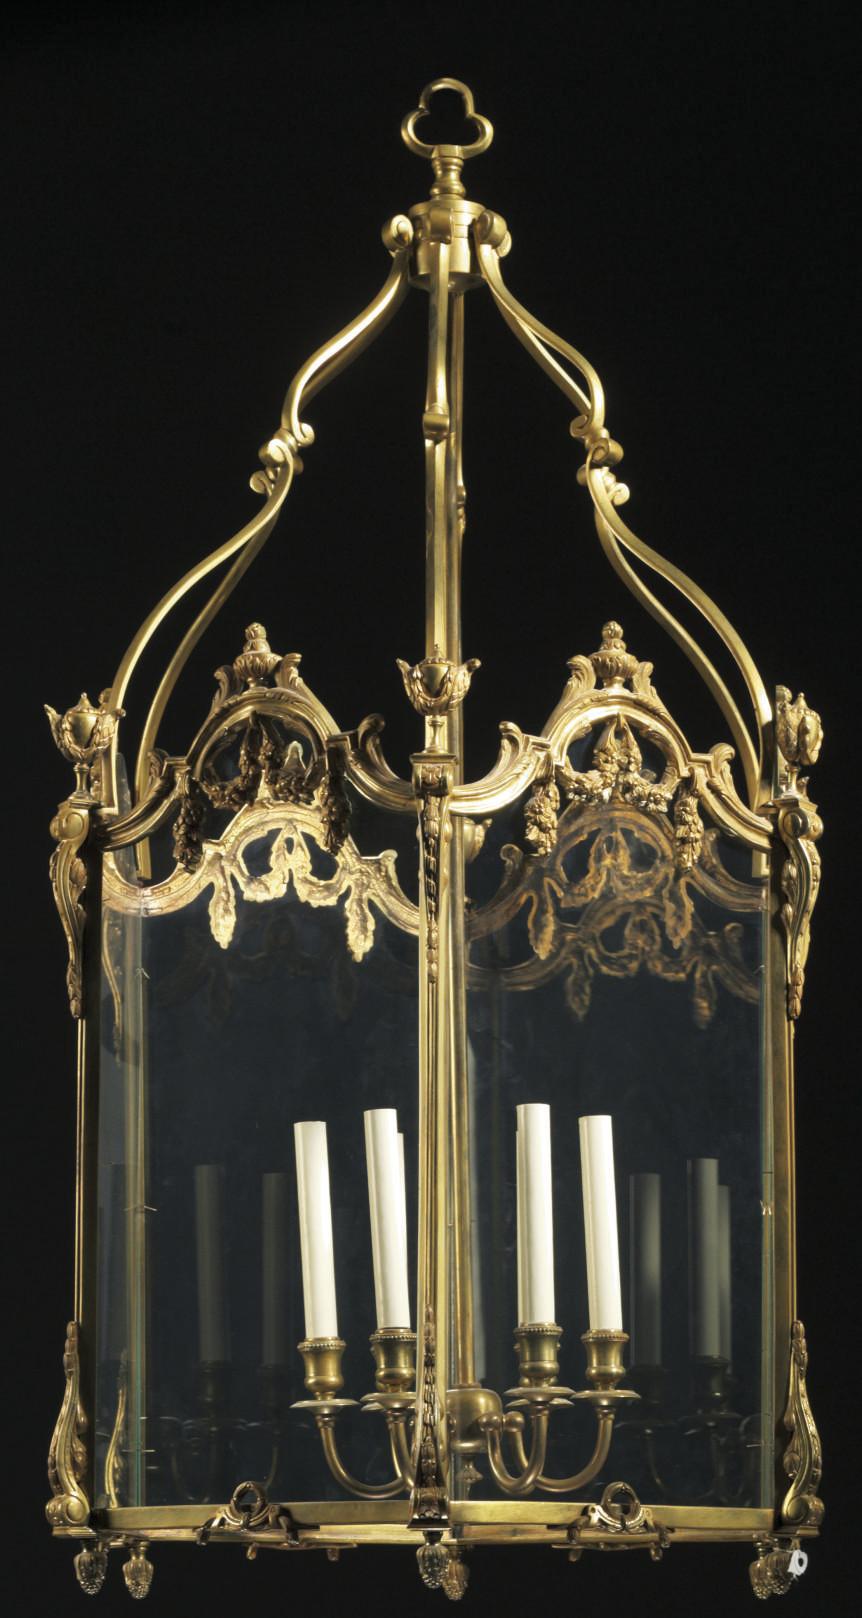 A FRENCH ORMOLU AND GLASS HALL